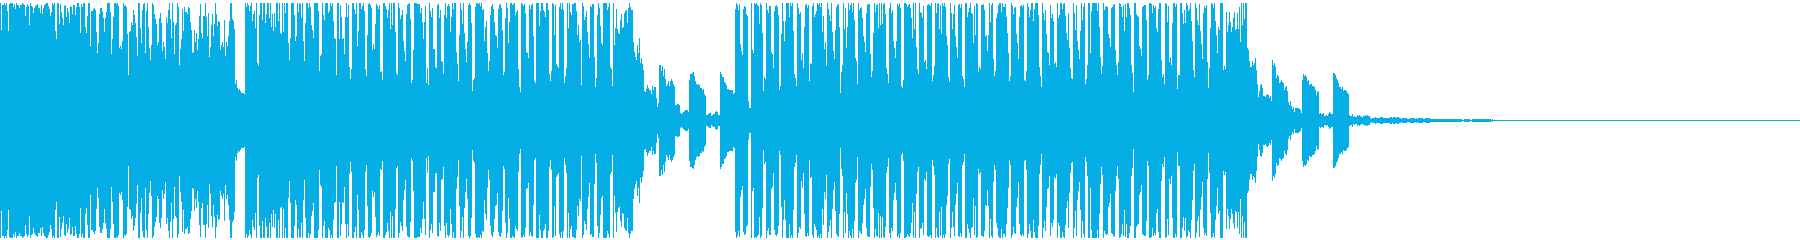 【EDM】クラブダンスミュージック3の再生済みの波形